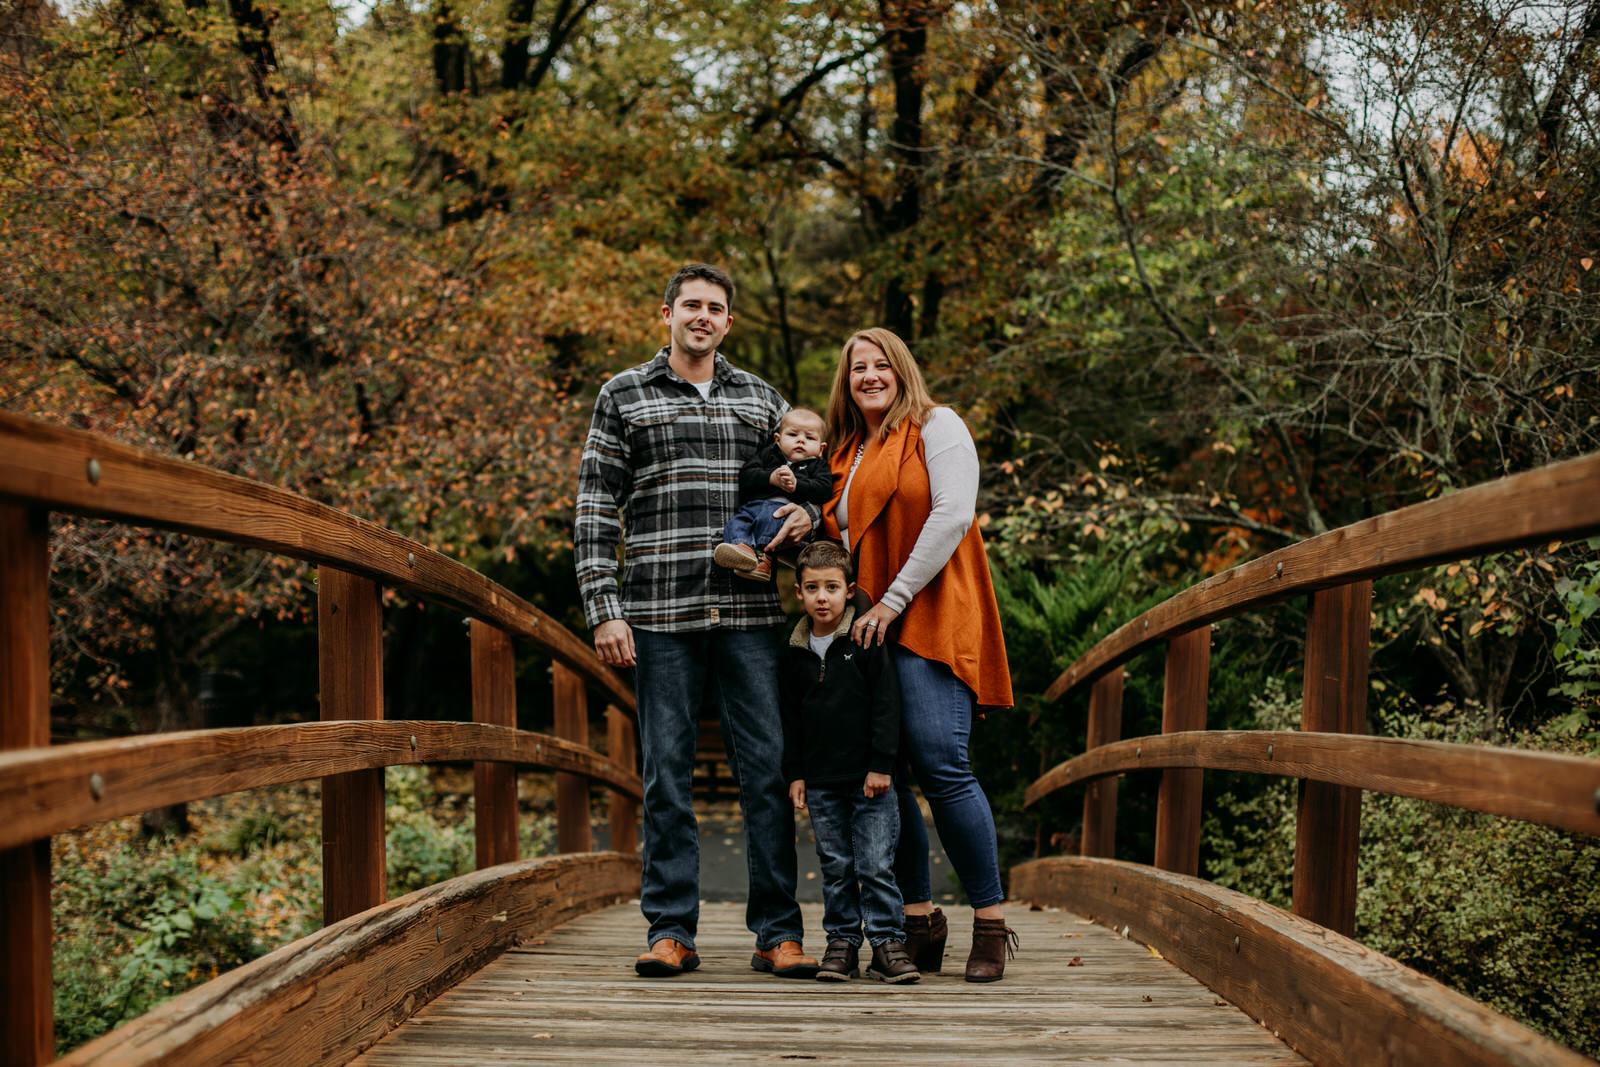 Mast Family Fall Photos at Twin Oaks Park in Ballwin, Missouri by St. Louis Family Photographer North Arrow Creative